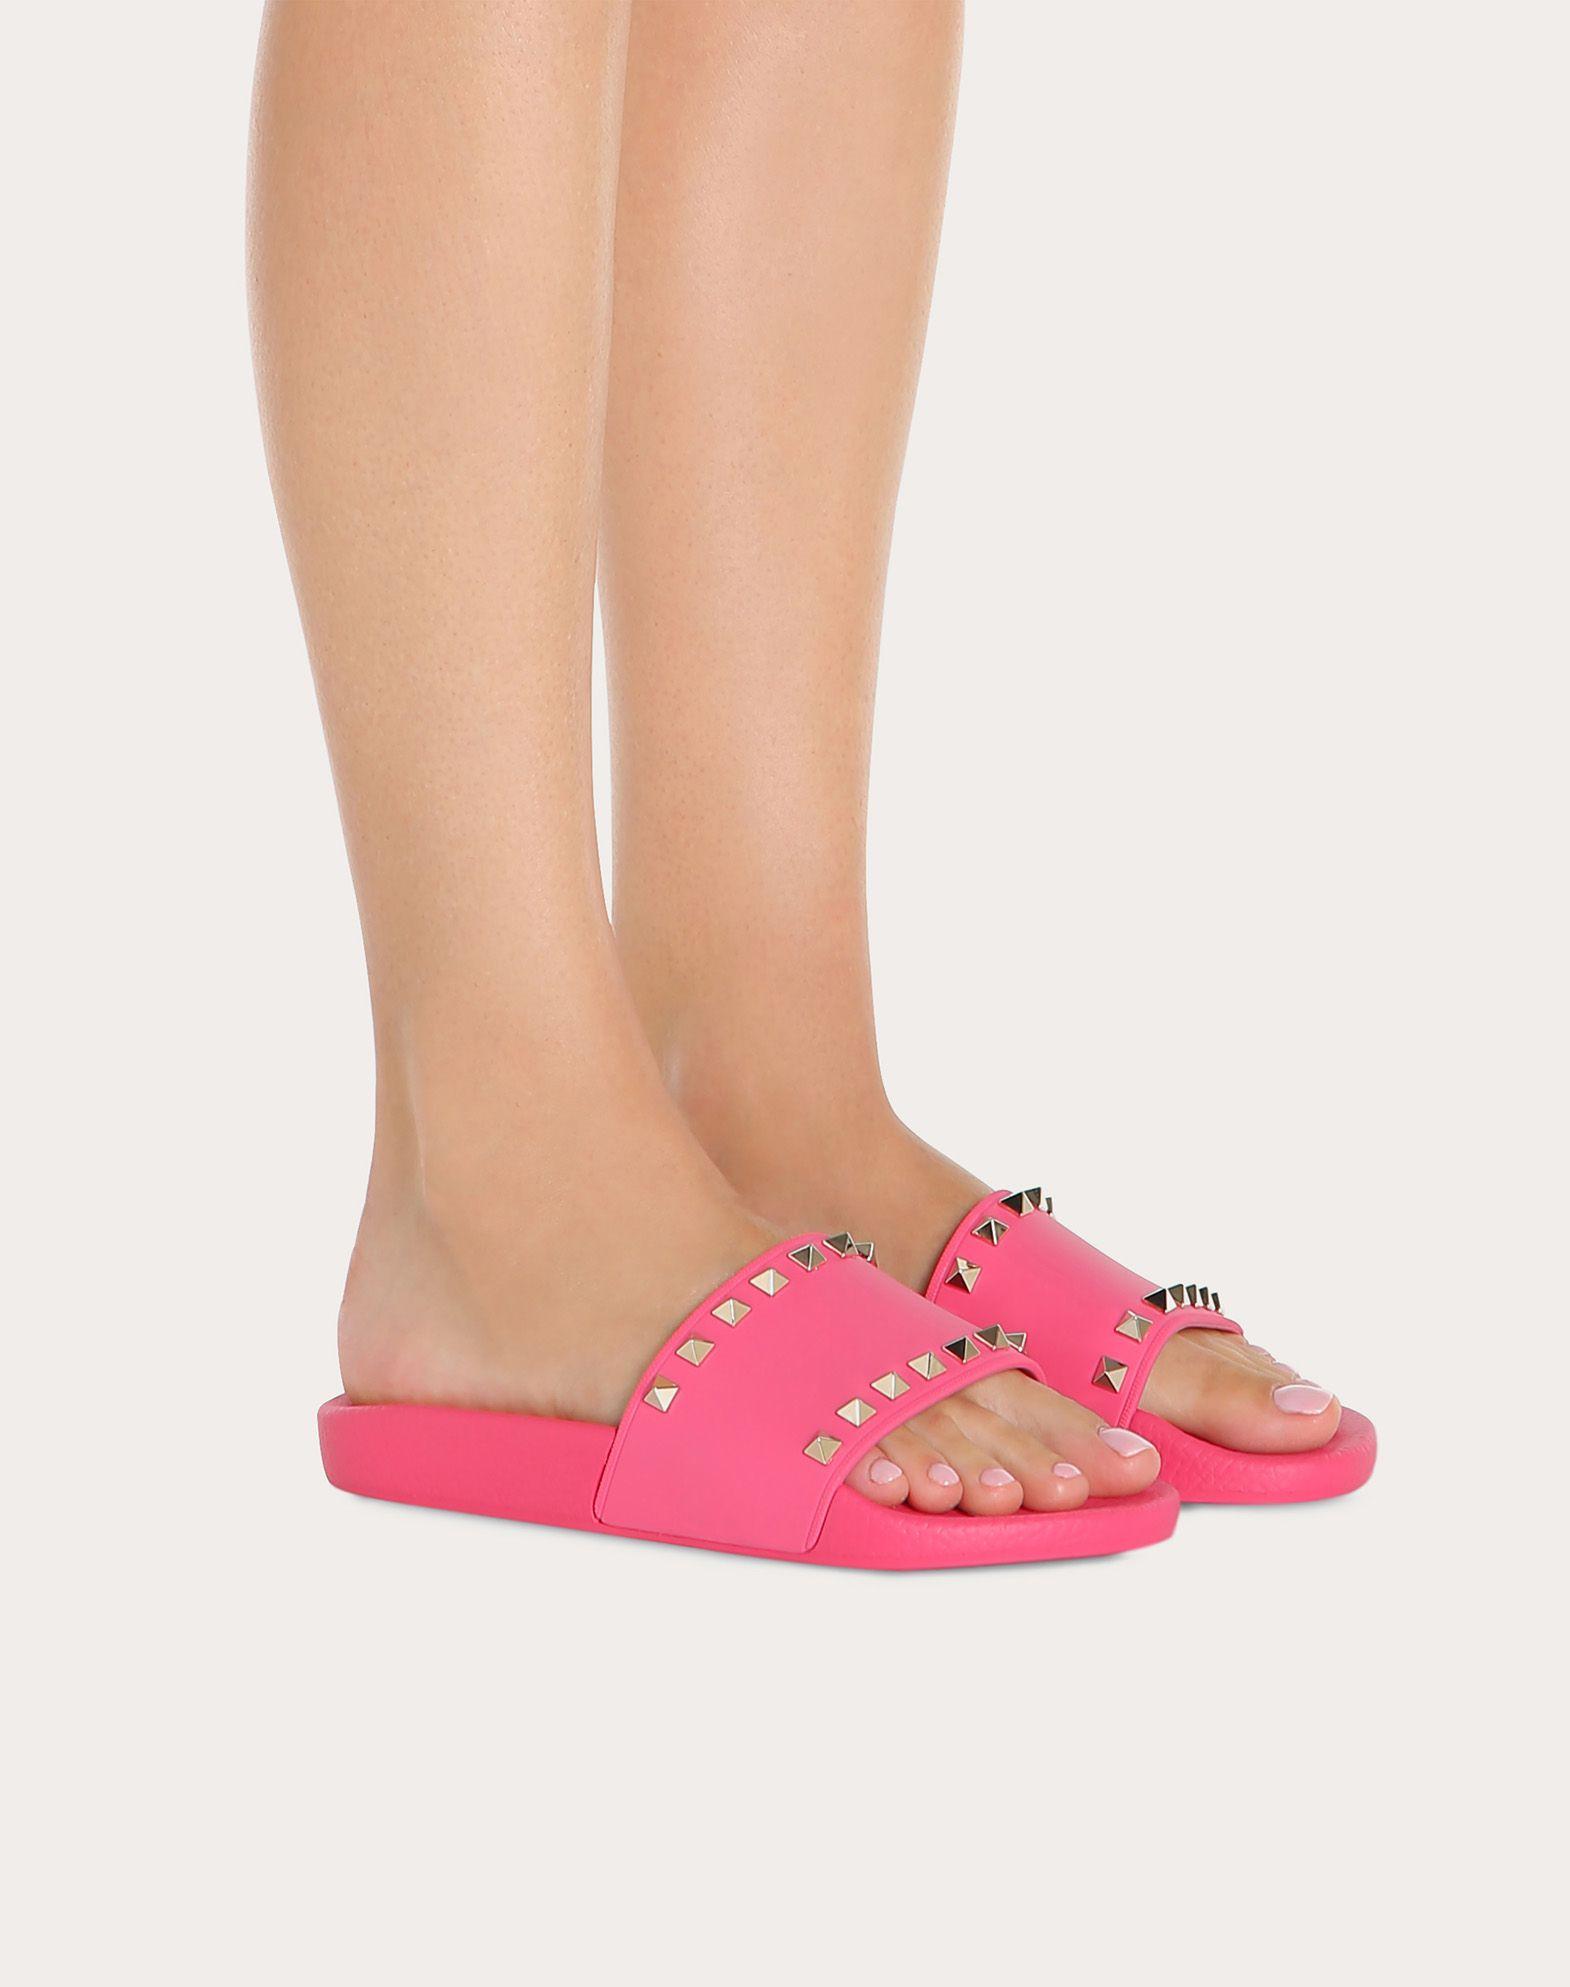 VALENTINO GARAVANI Rockstud PVC Slide Sandal SLIDE SANDAL D b